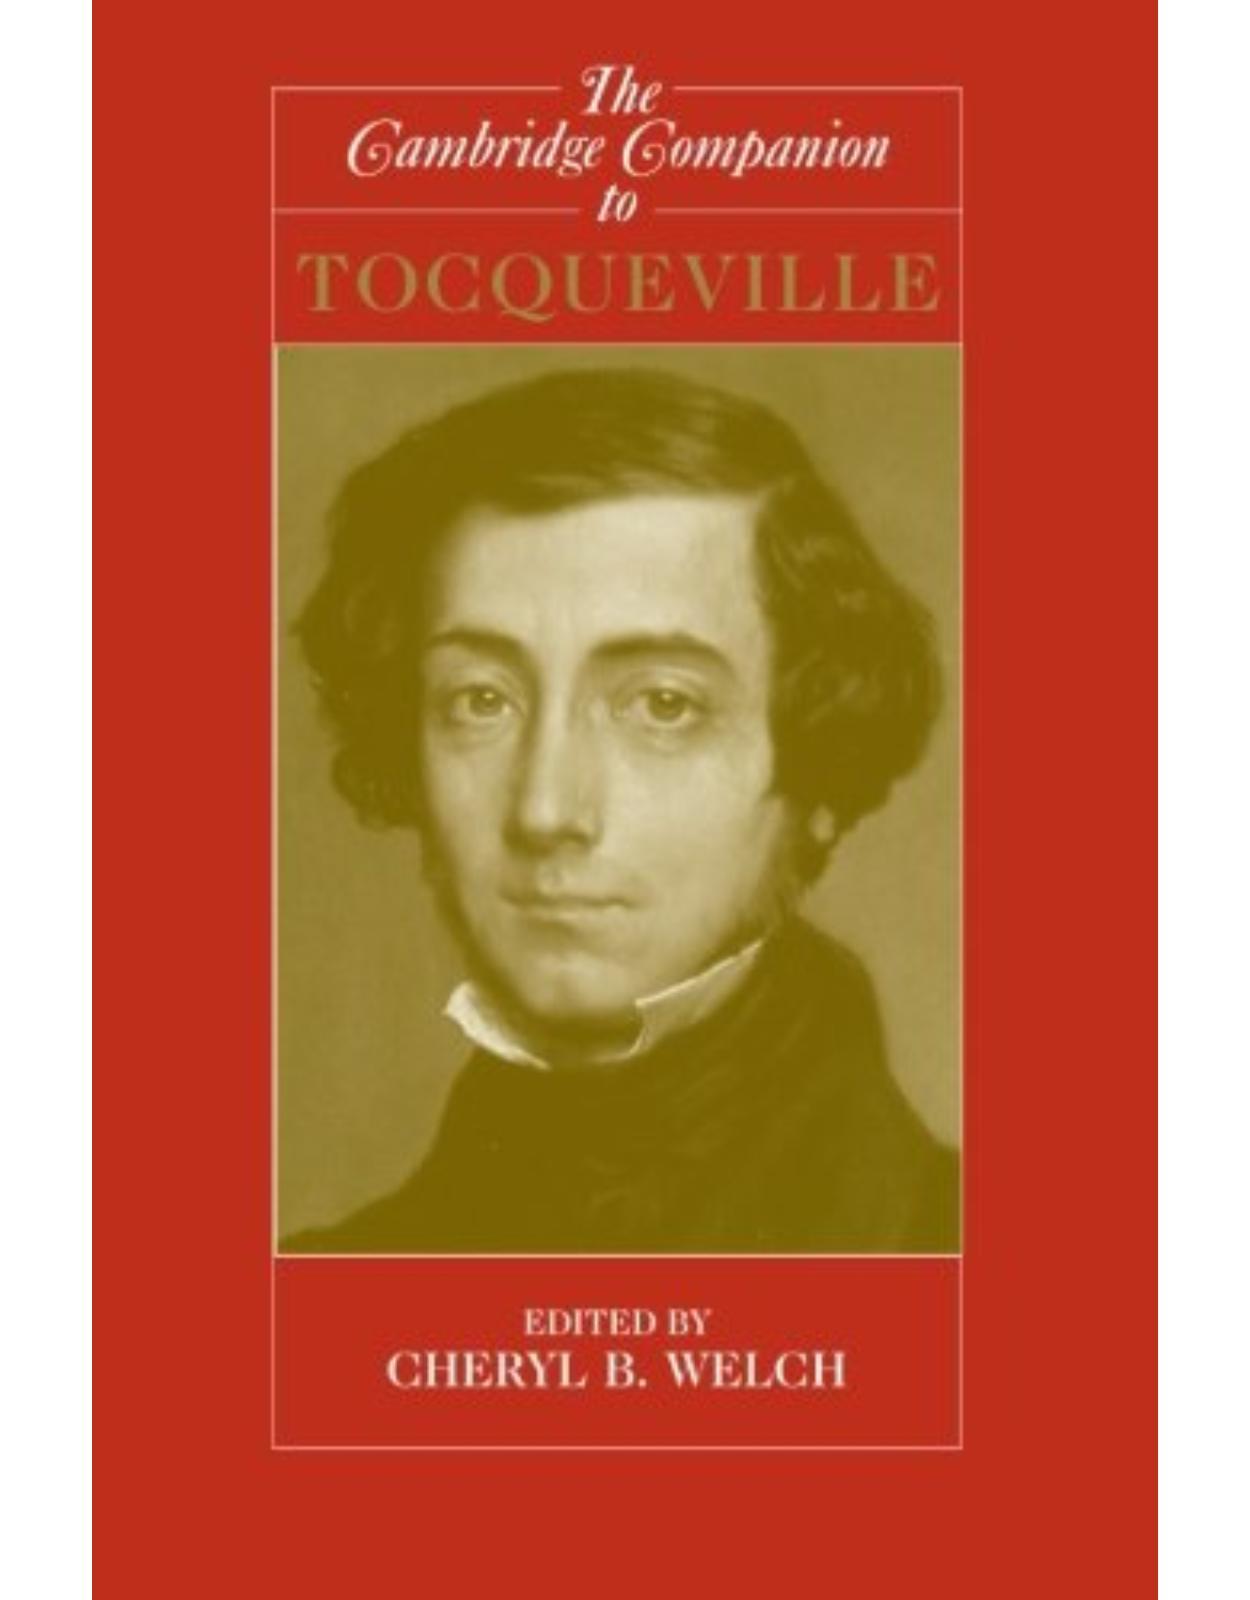 The Cambridge Companion to Tocqueville (Cambridge Companions to Philosophy)